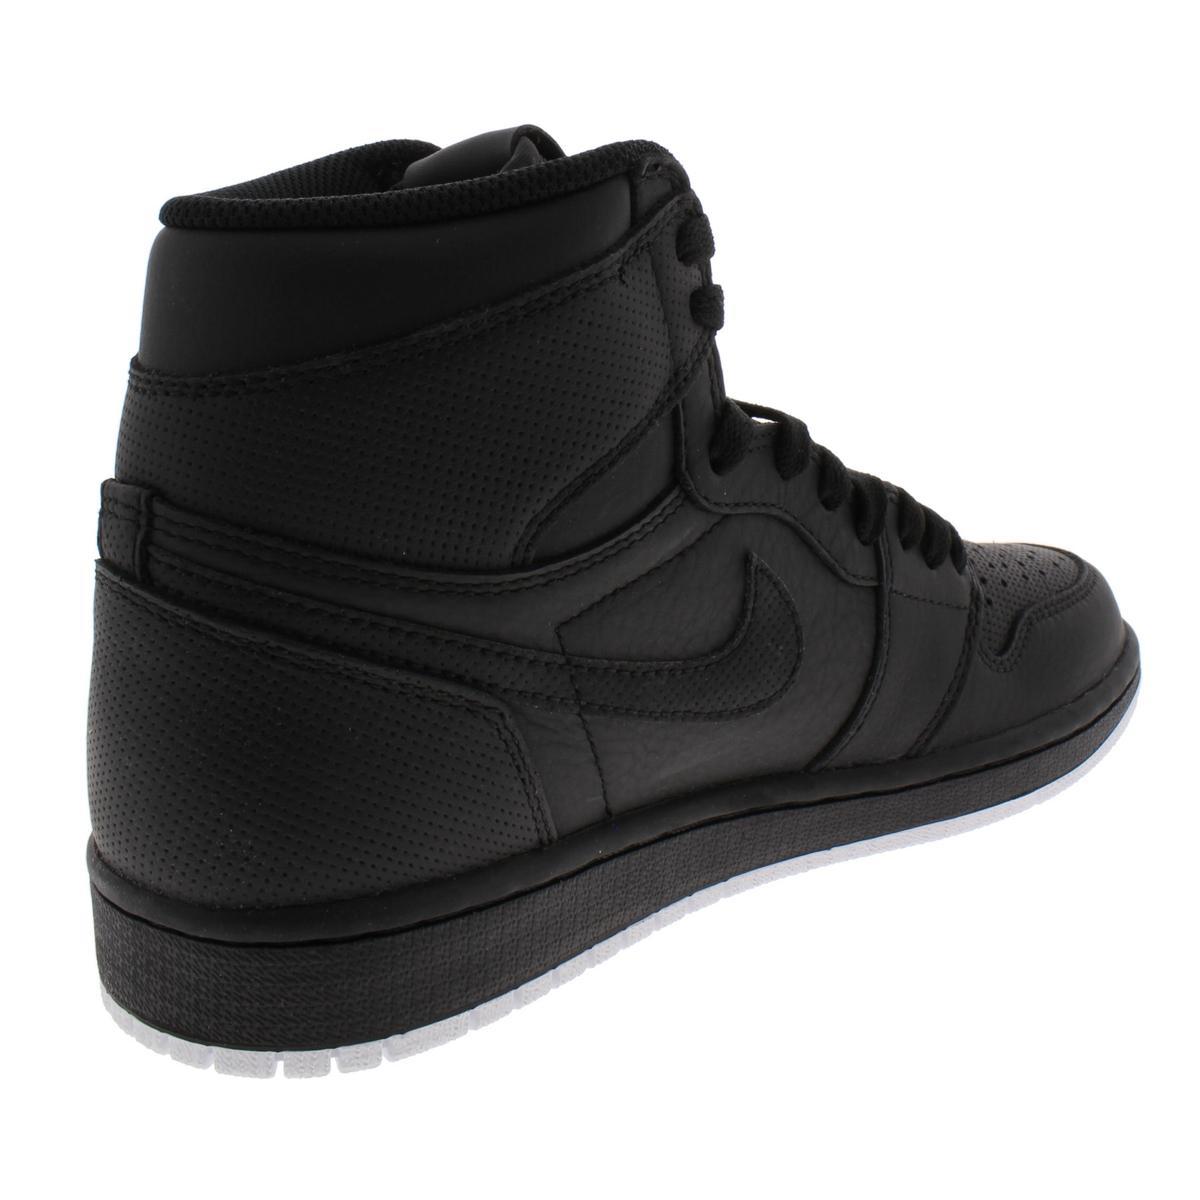 Nike-Mens-Air-Jordan-1-Retro-High-OG-Retro-Basketball-Shoes-Sneakers-BHFO-5612 thumbnail 4